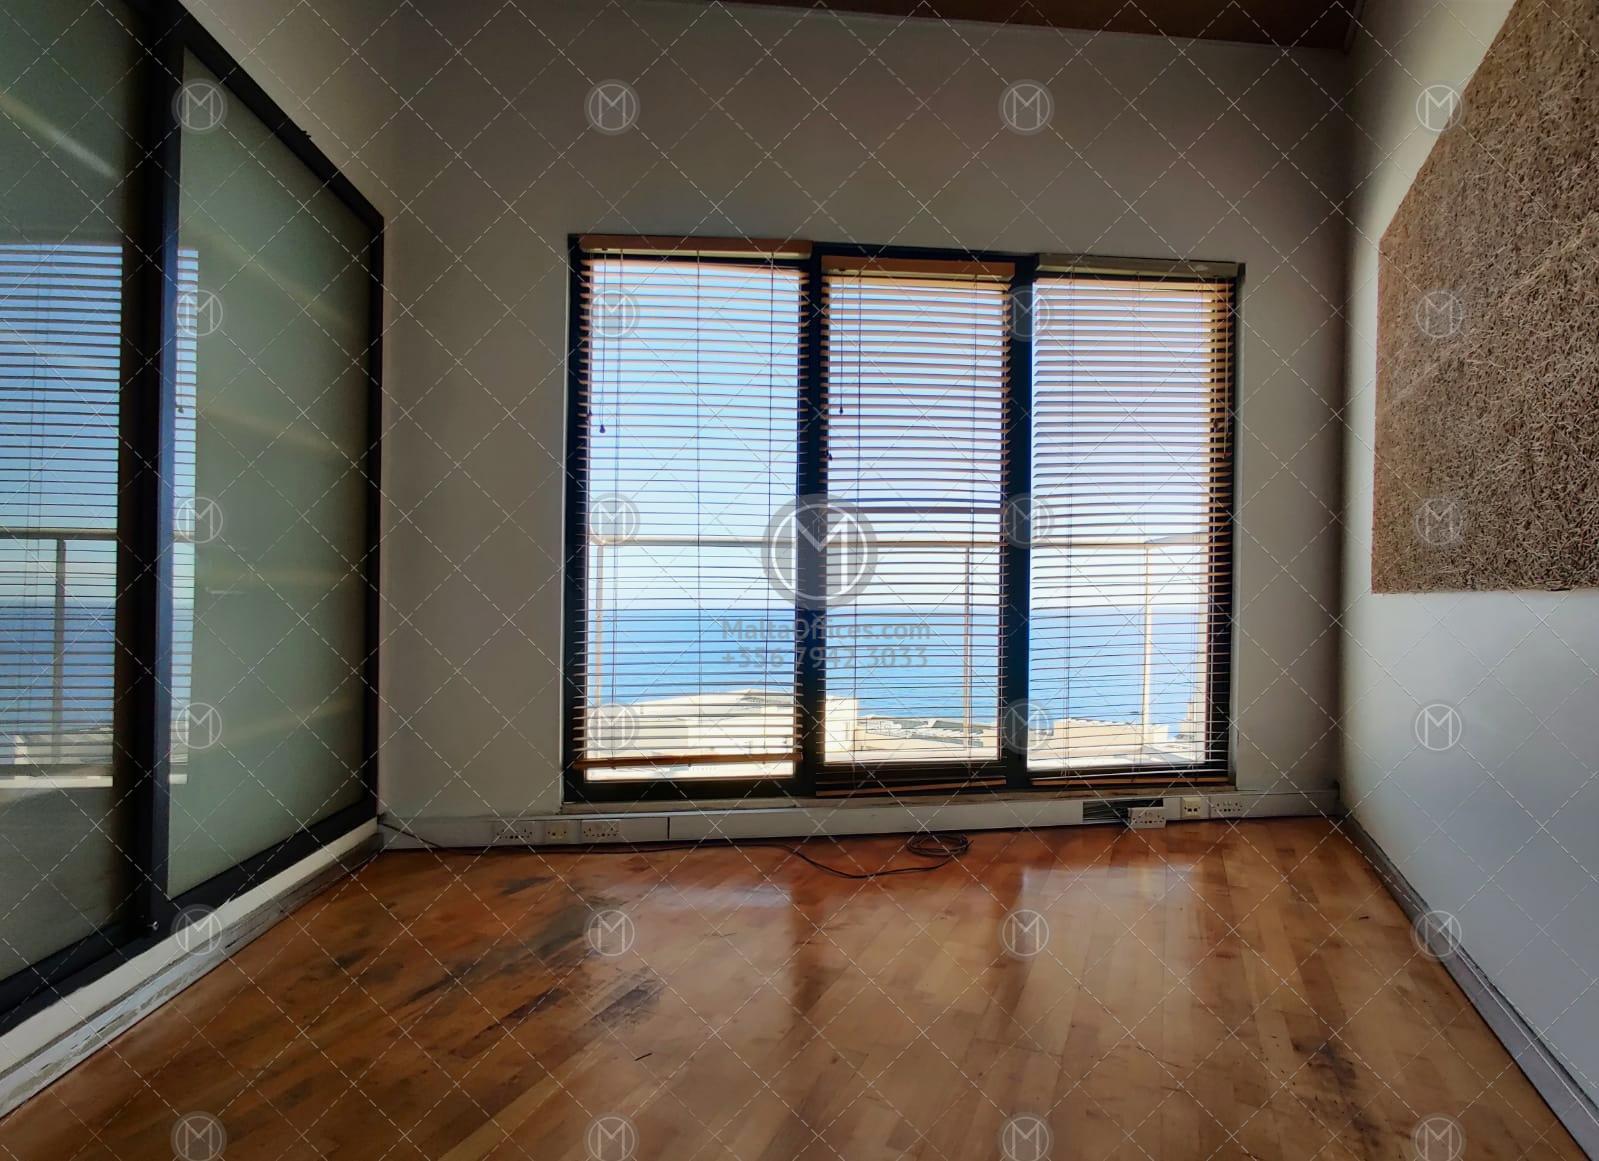 Portomaso Office for Rent (114m2)